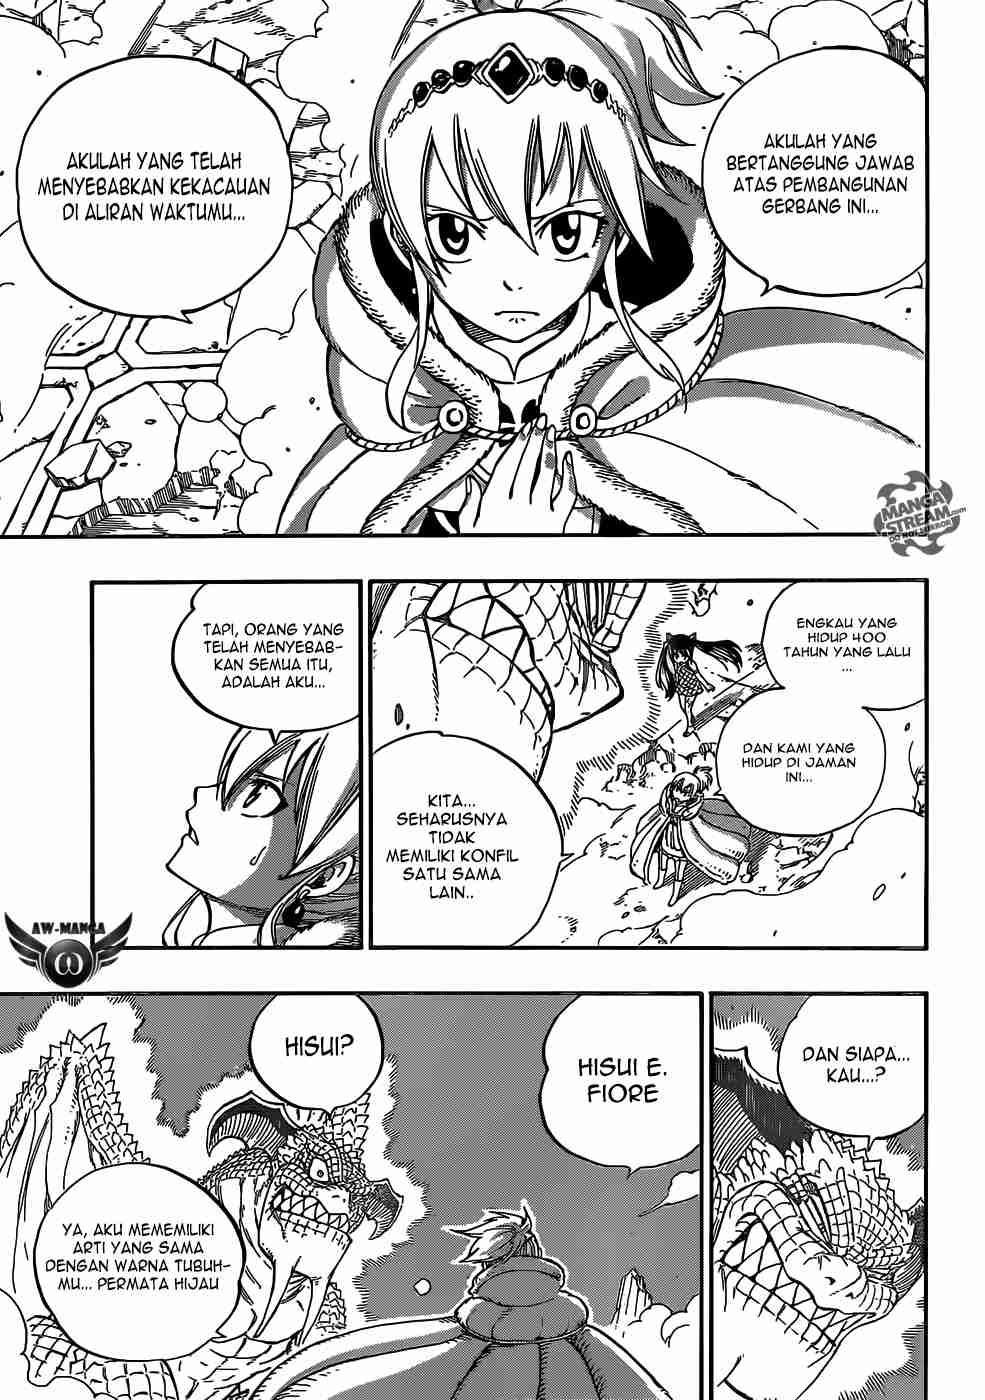 Komik fairy tail 337 - rencana emas 338 Indonesia fairy tail 337 - rencana emas Terbaru 8|Baca Manga Komik Indonesia|Mangacan